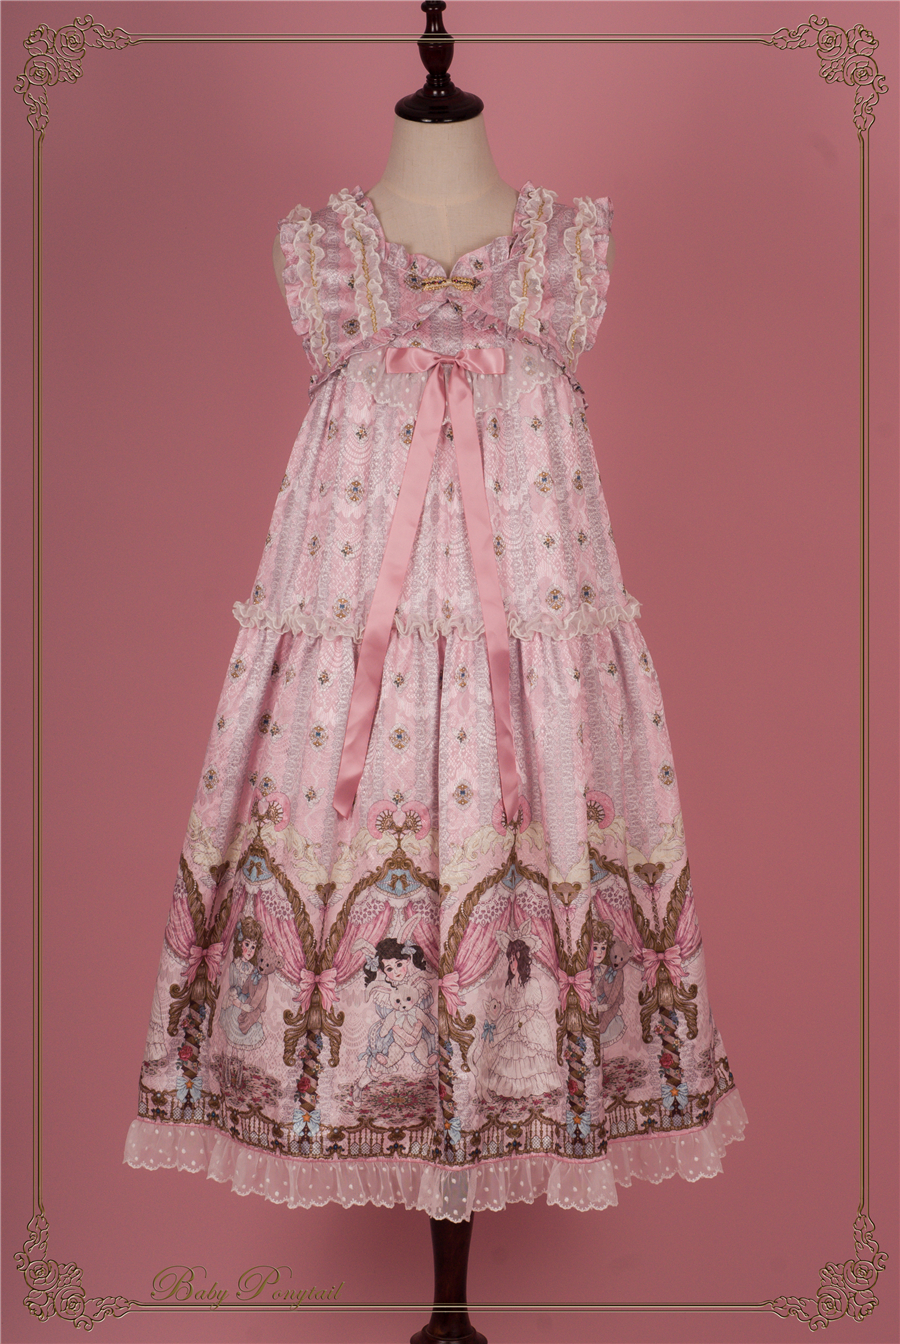 BabyPonytail_Stock Photo_My Favorite Companion_JSK Baby Doll Pink_01.jpg